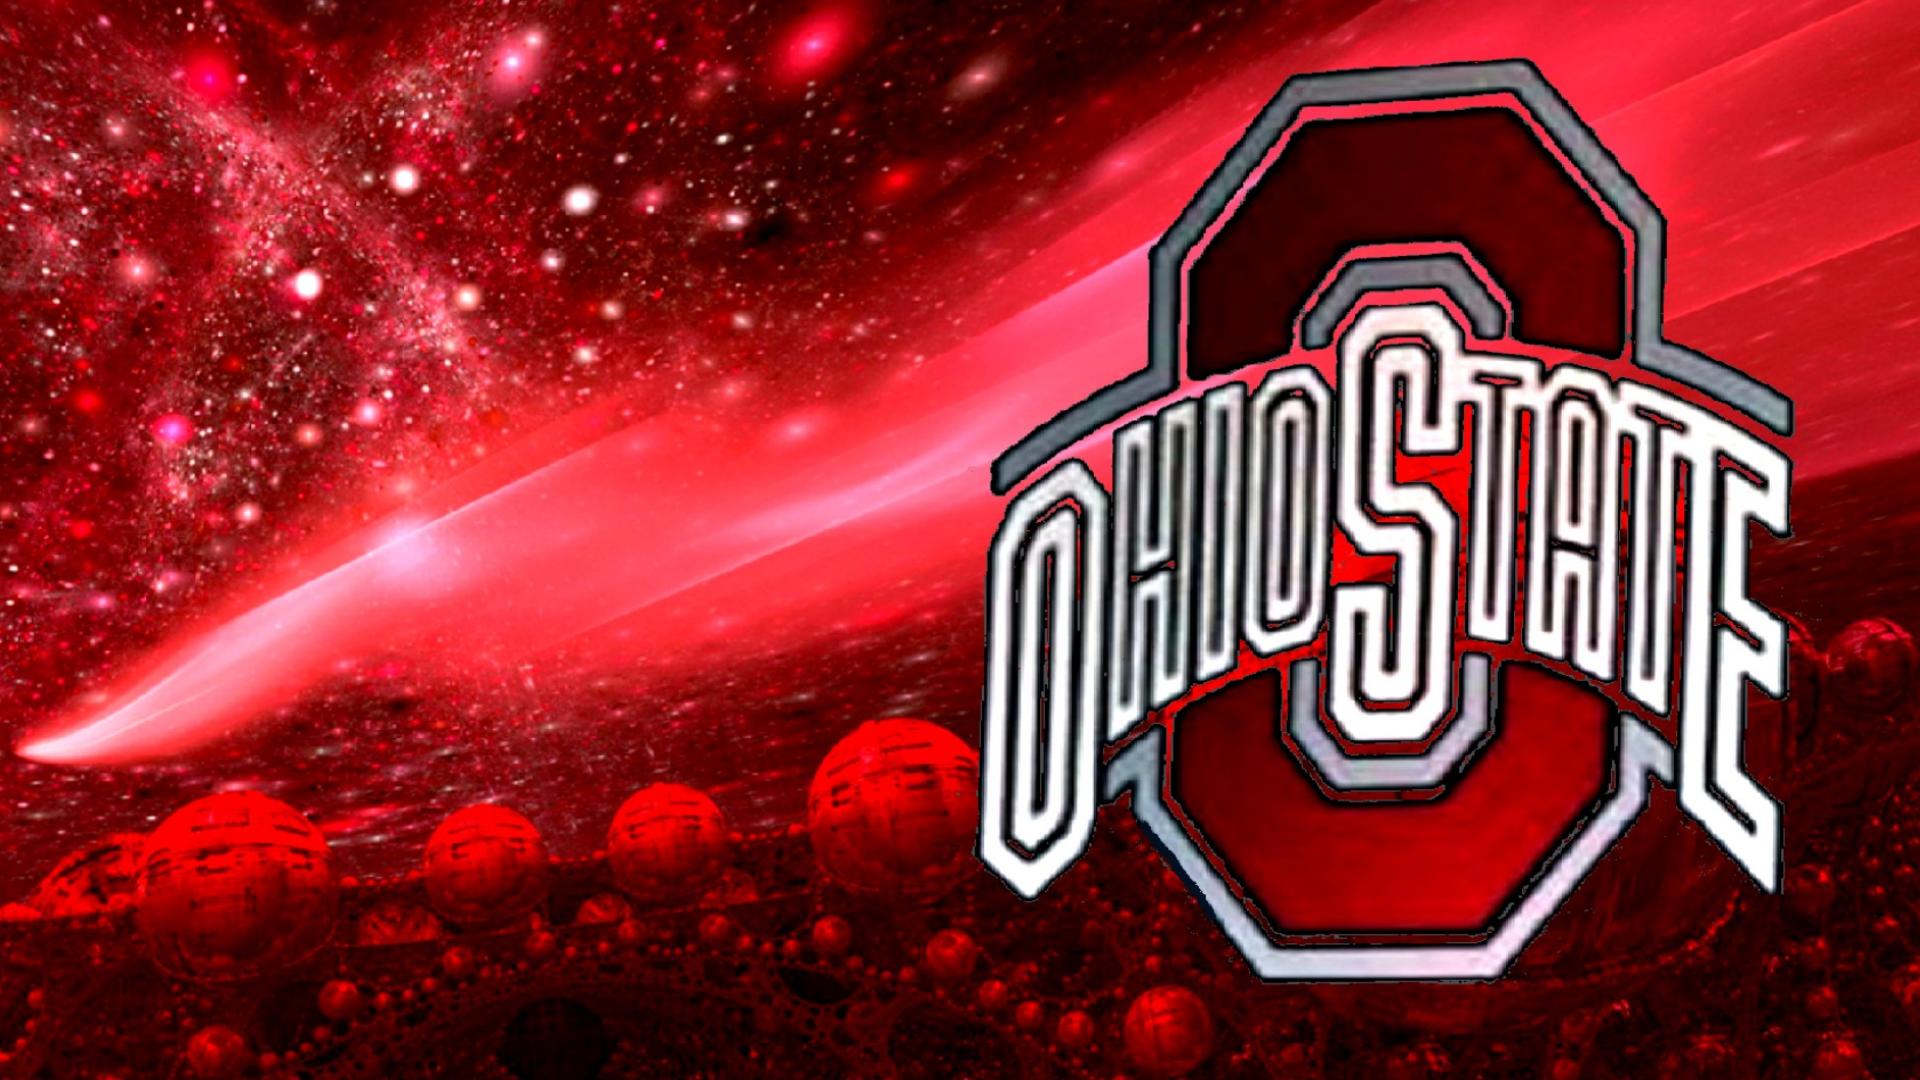 Ohio State Football Desktop